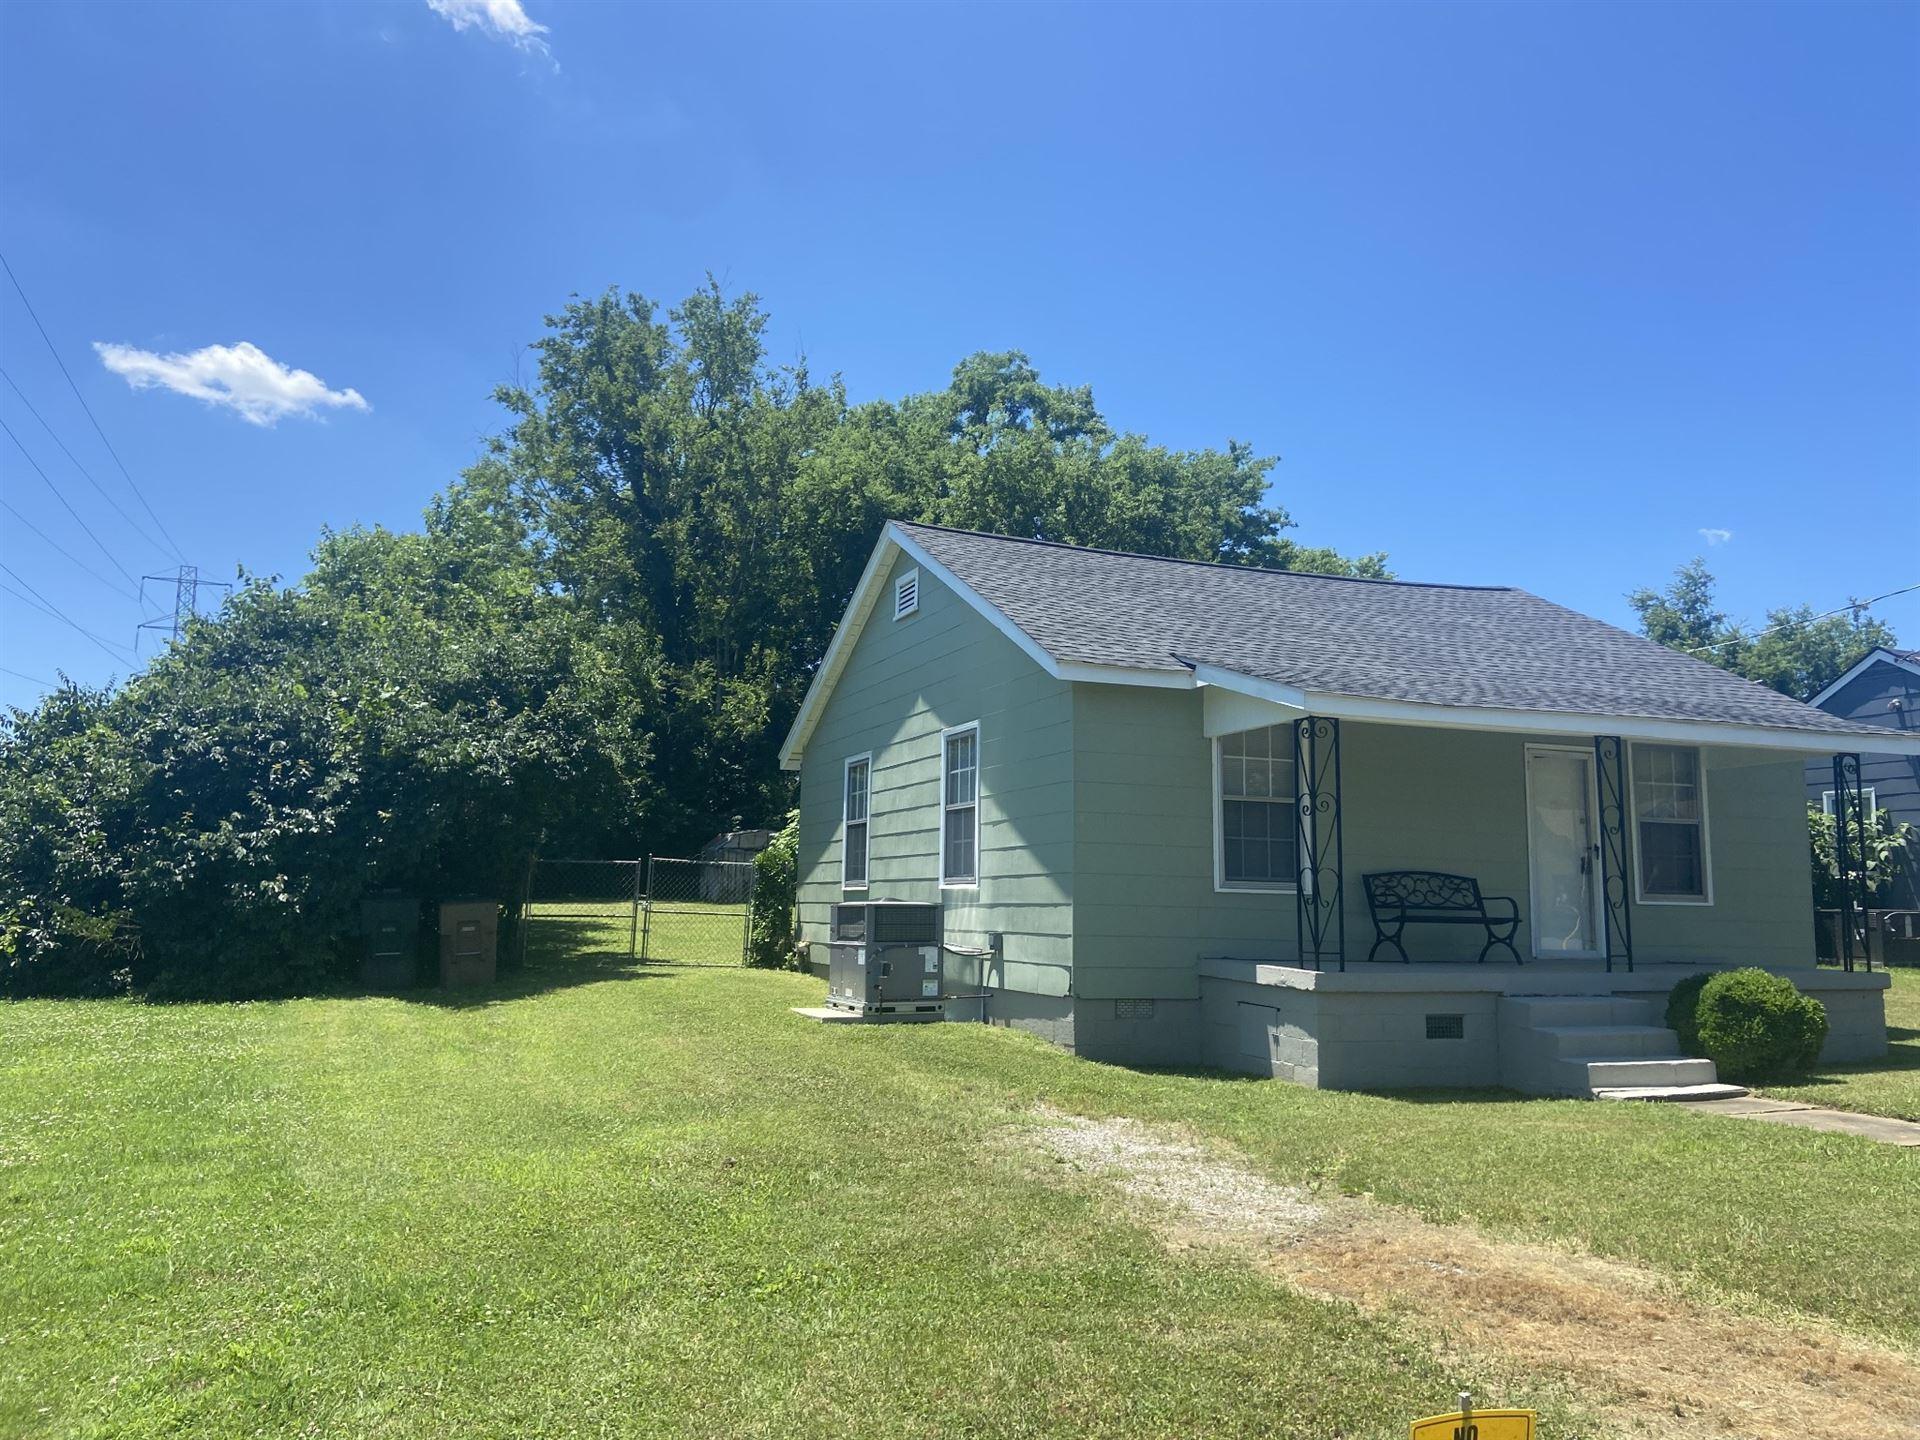 Photo of 1724 Hanover Rd, Nashville, TN 37216 (MLS # 2263198)